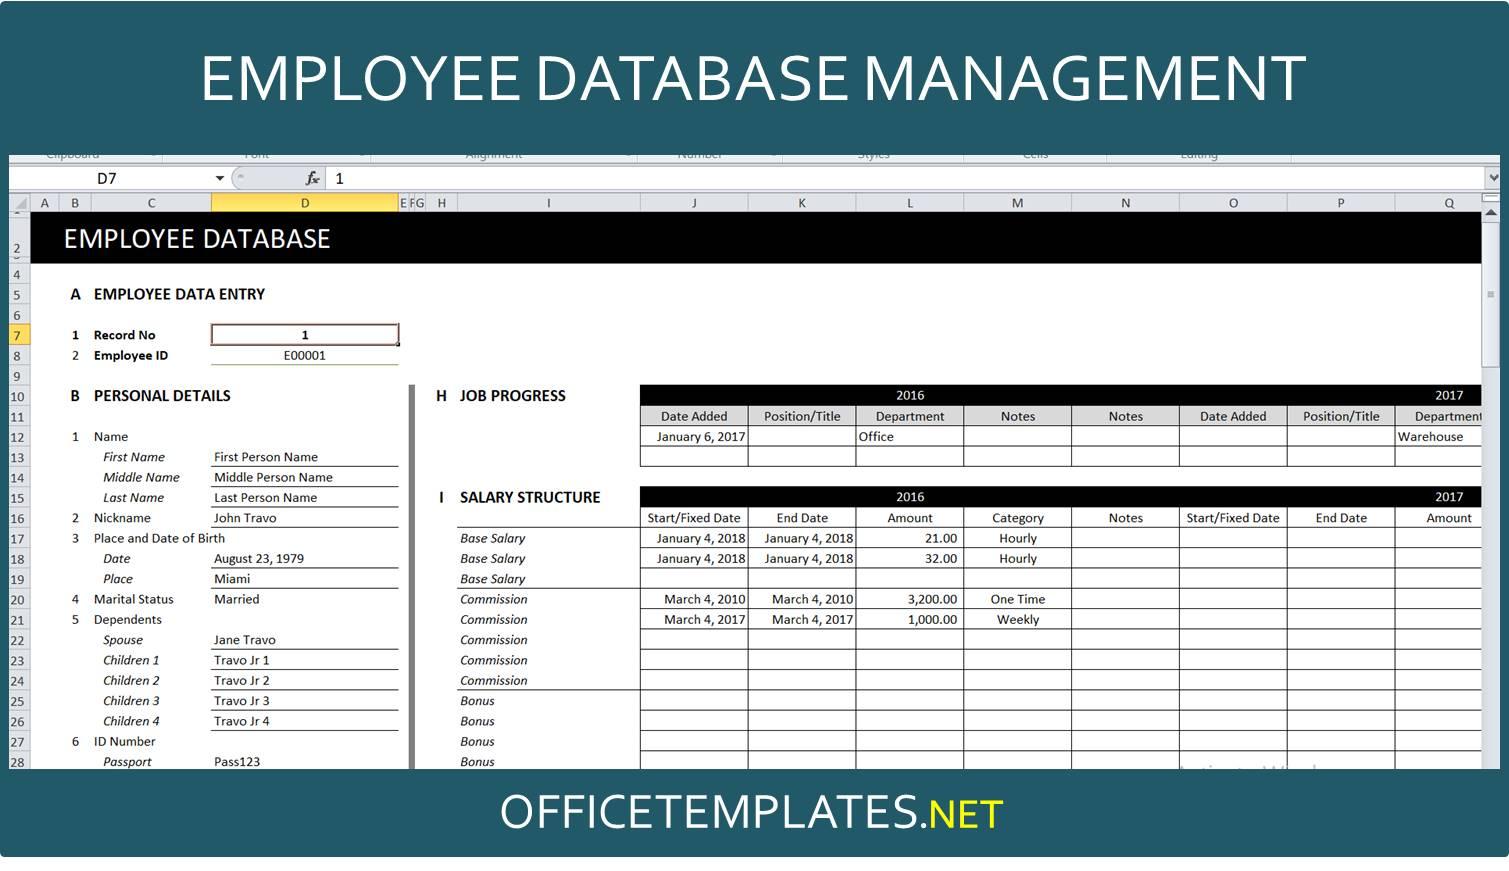 Employee Database Management Spreadsheet Officetemplates